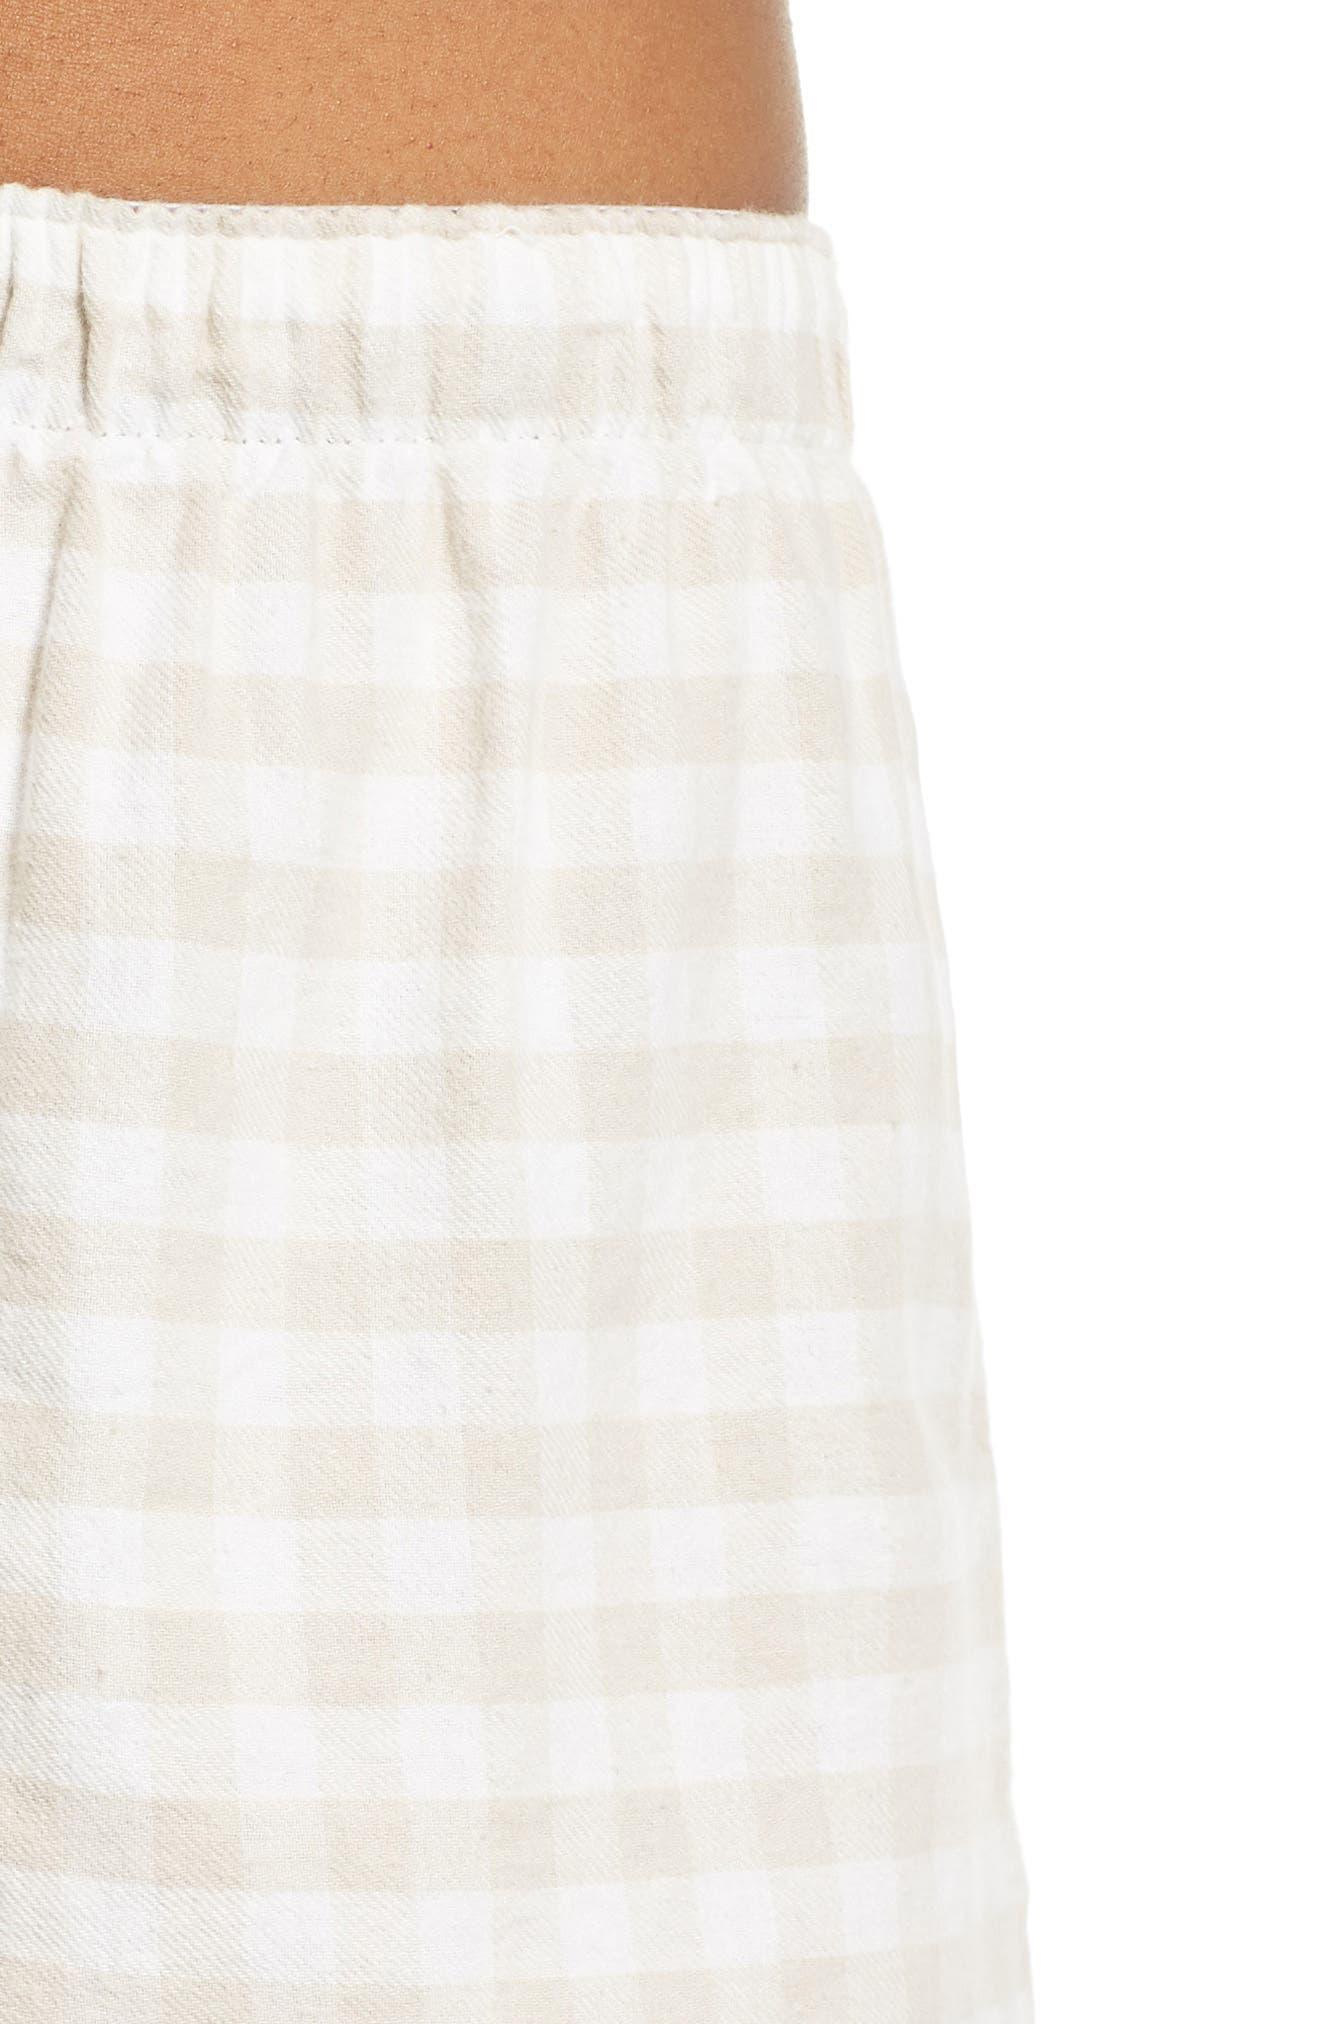 Gingham Pajama Shorts,                             Alternate thumbnail 4, color,                             250